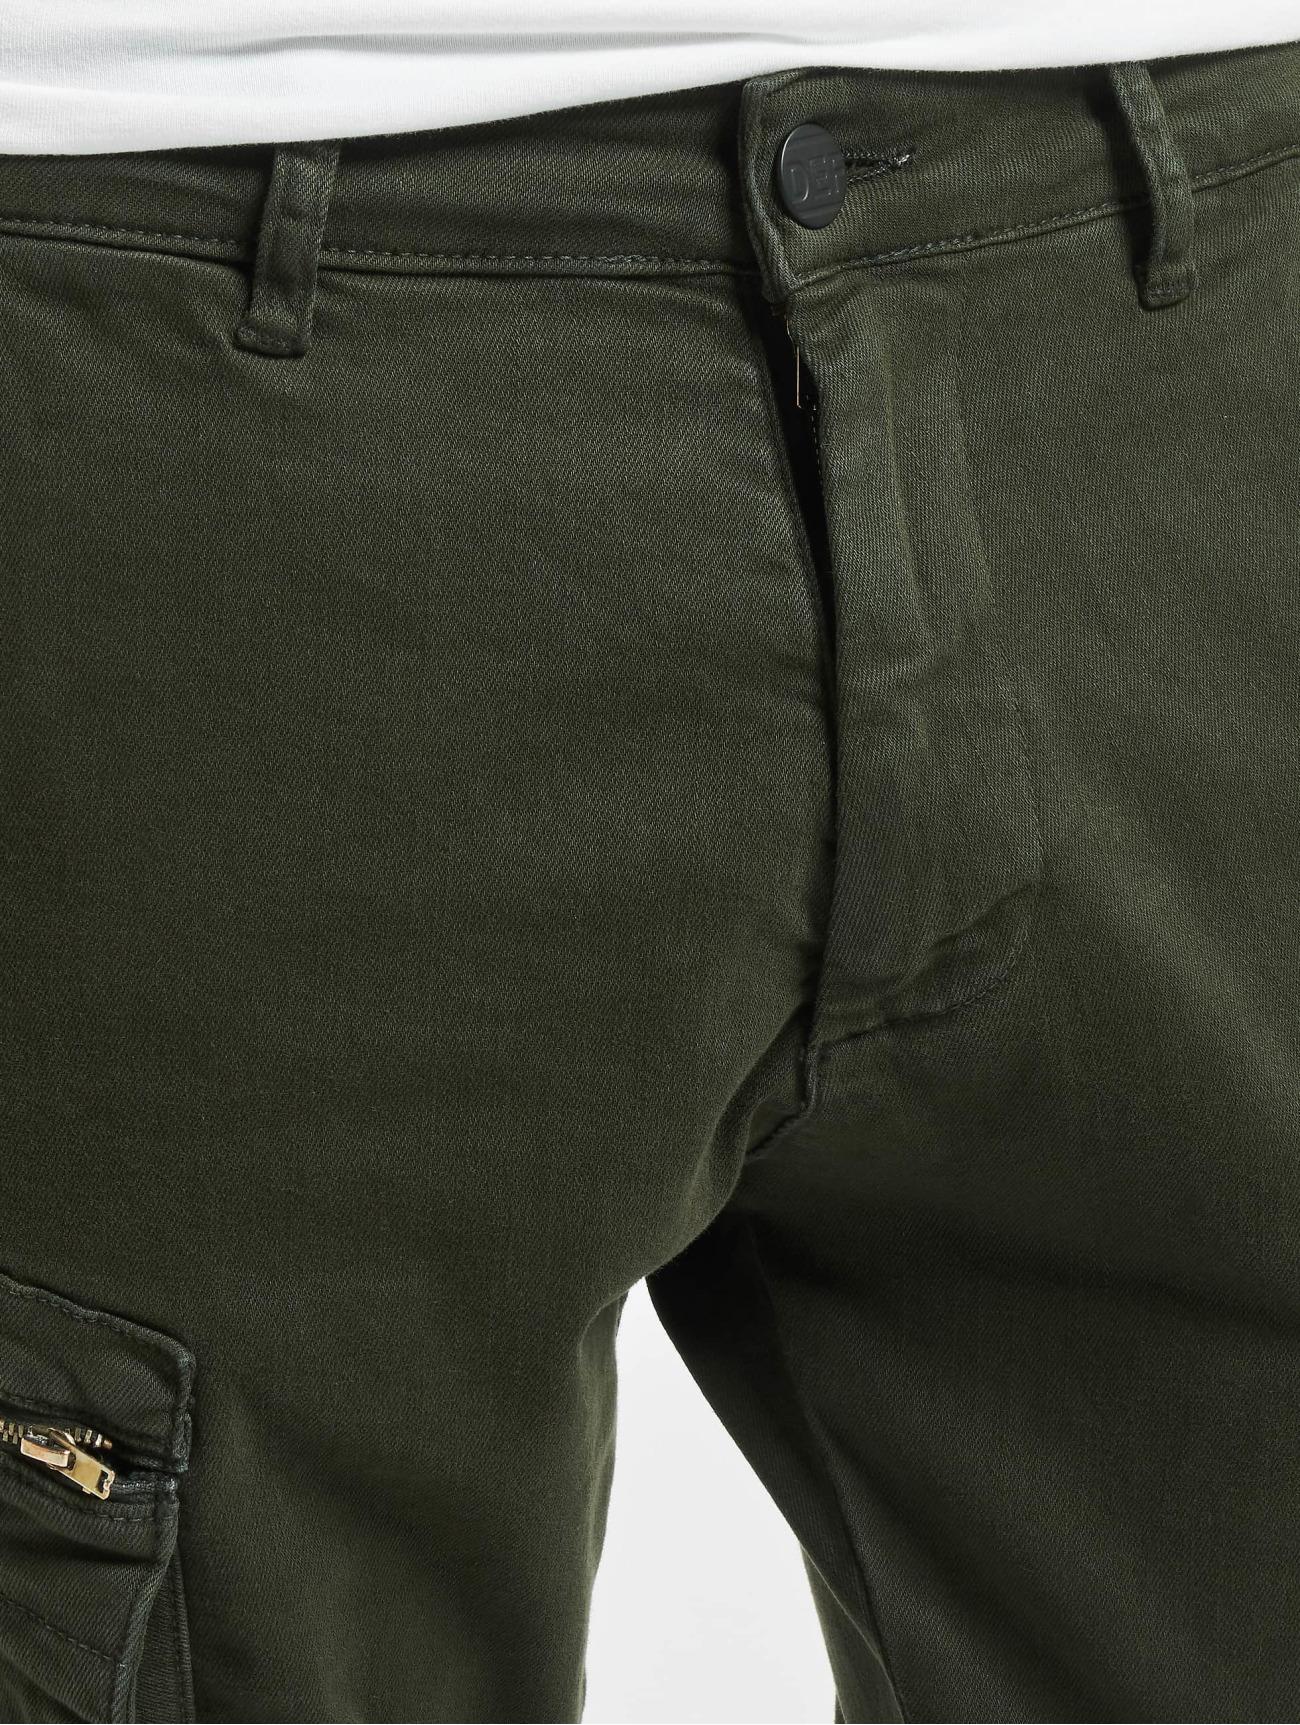 DEF Byxor / Cargo pants Kuro  i grön 664218 Män Byxor